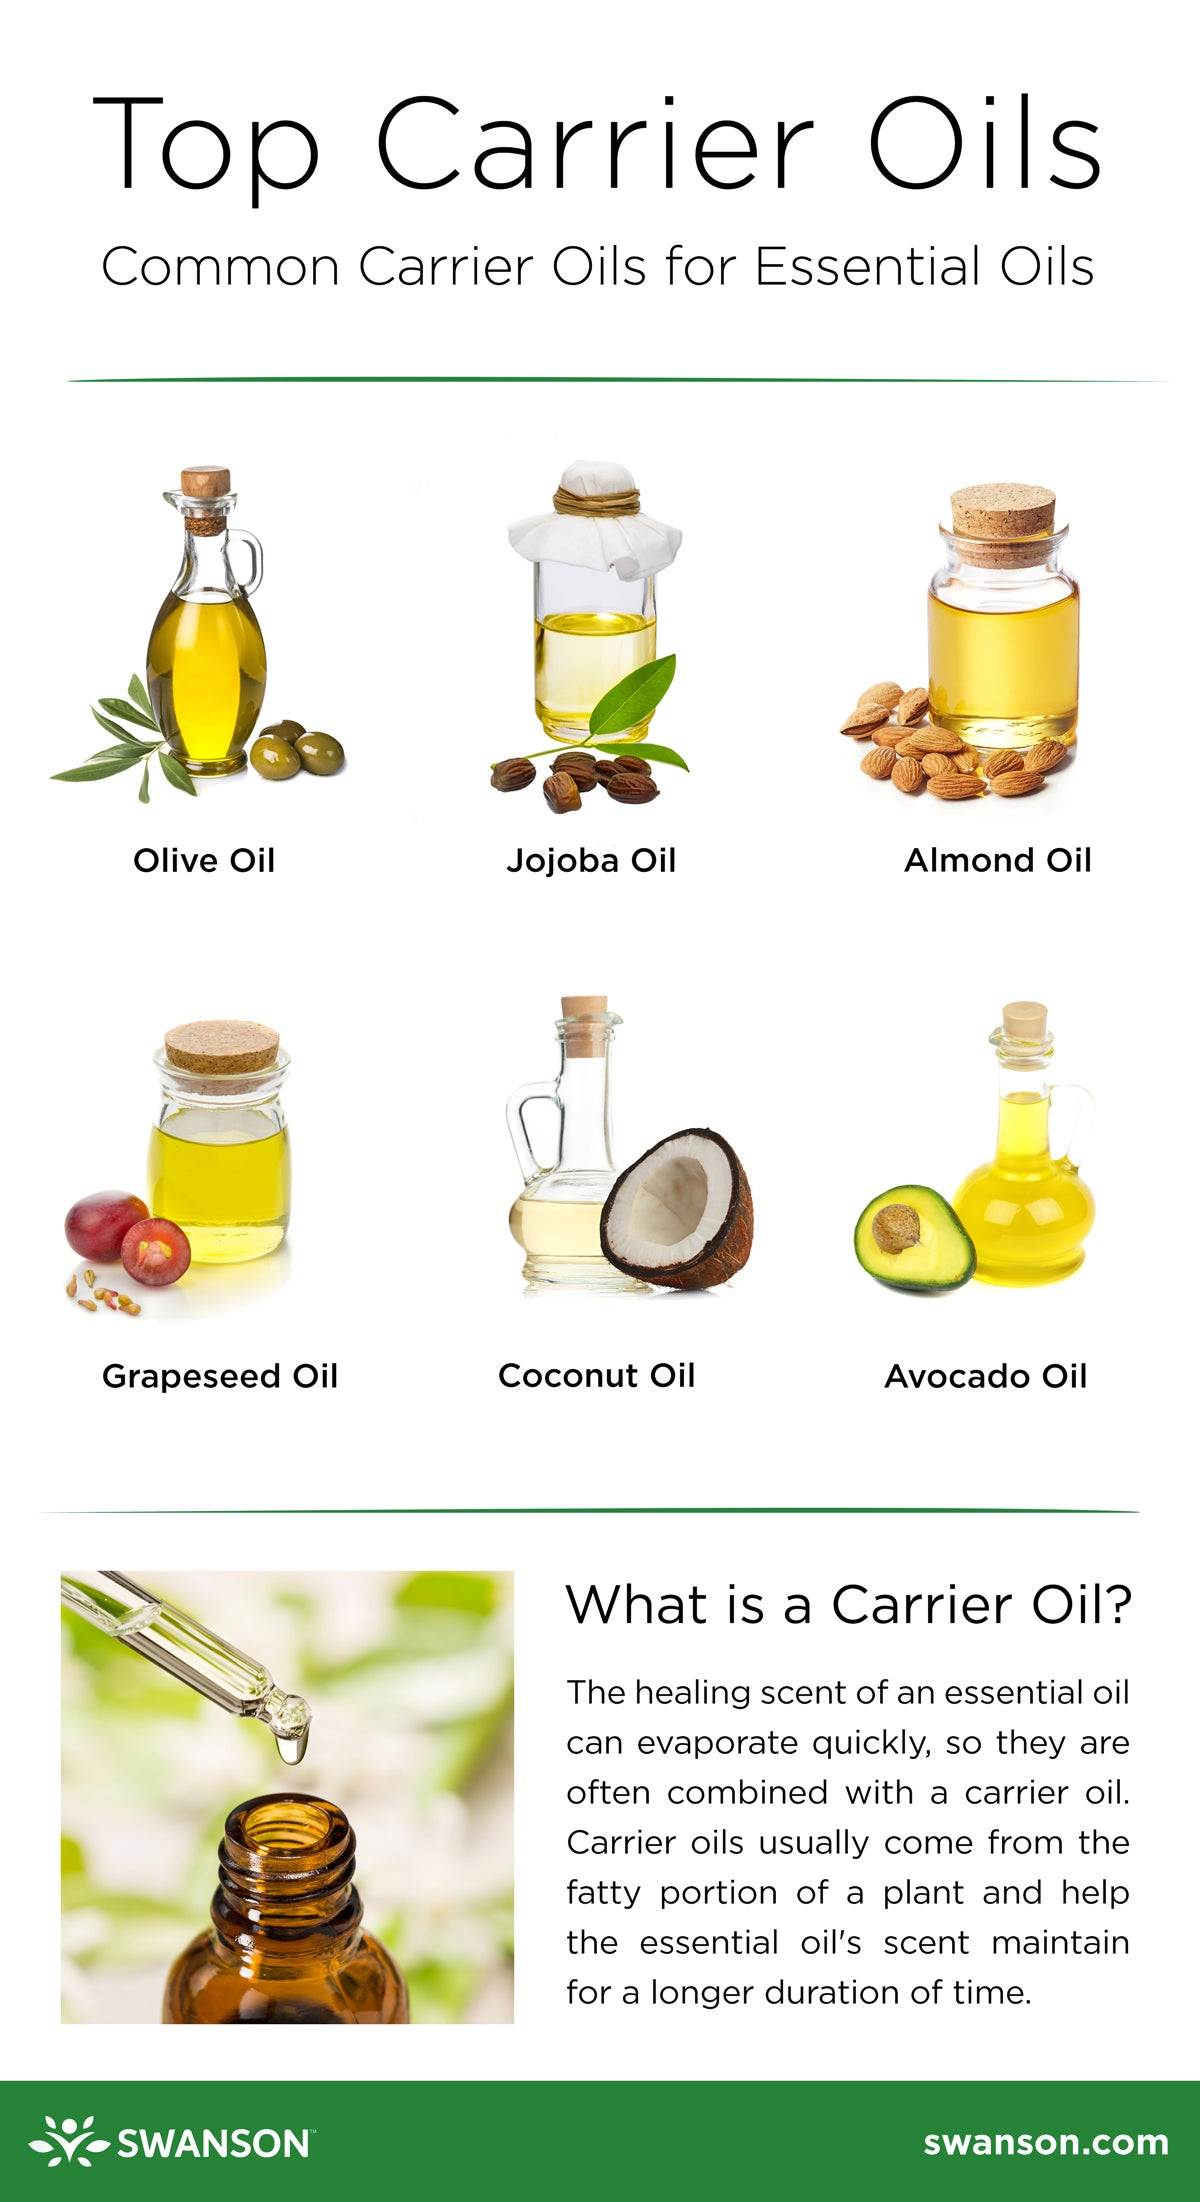 Carrier Oils for Essential Oils